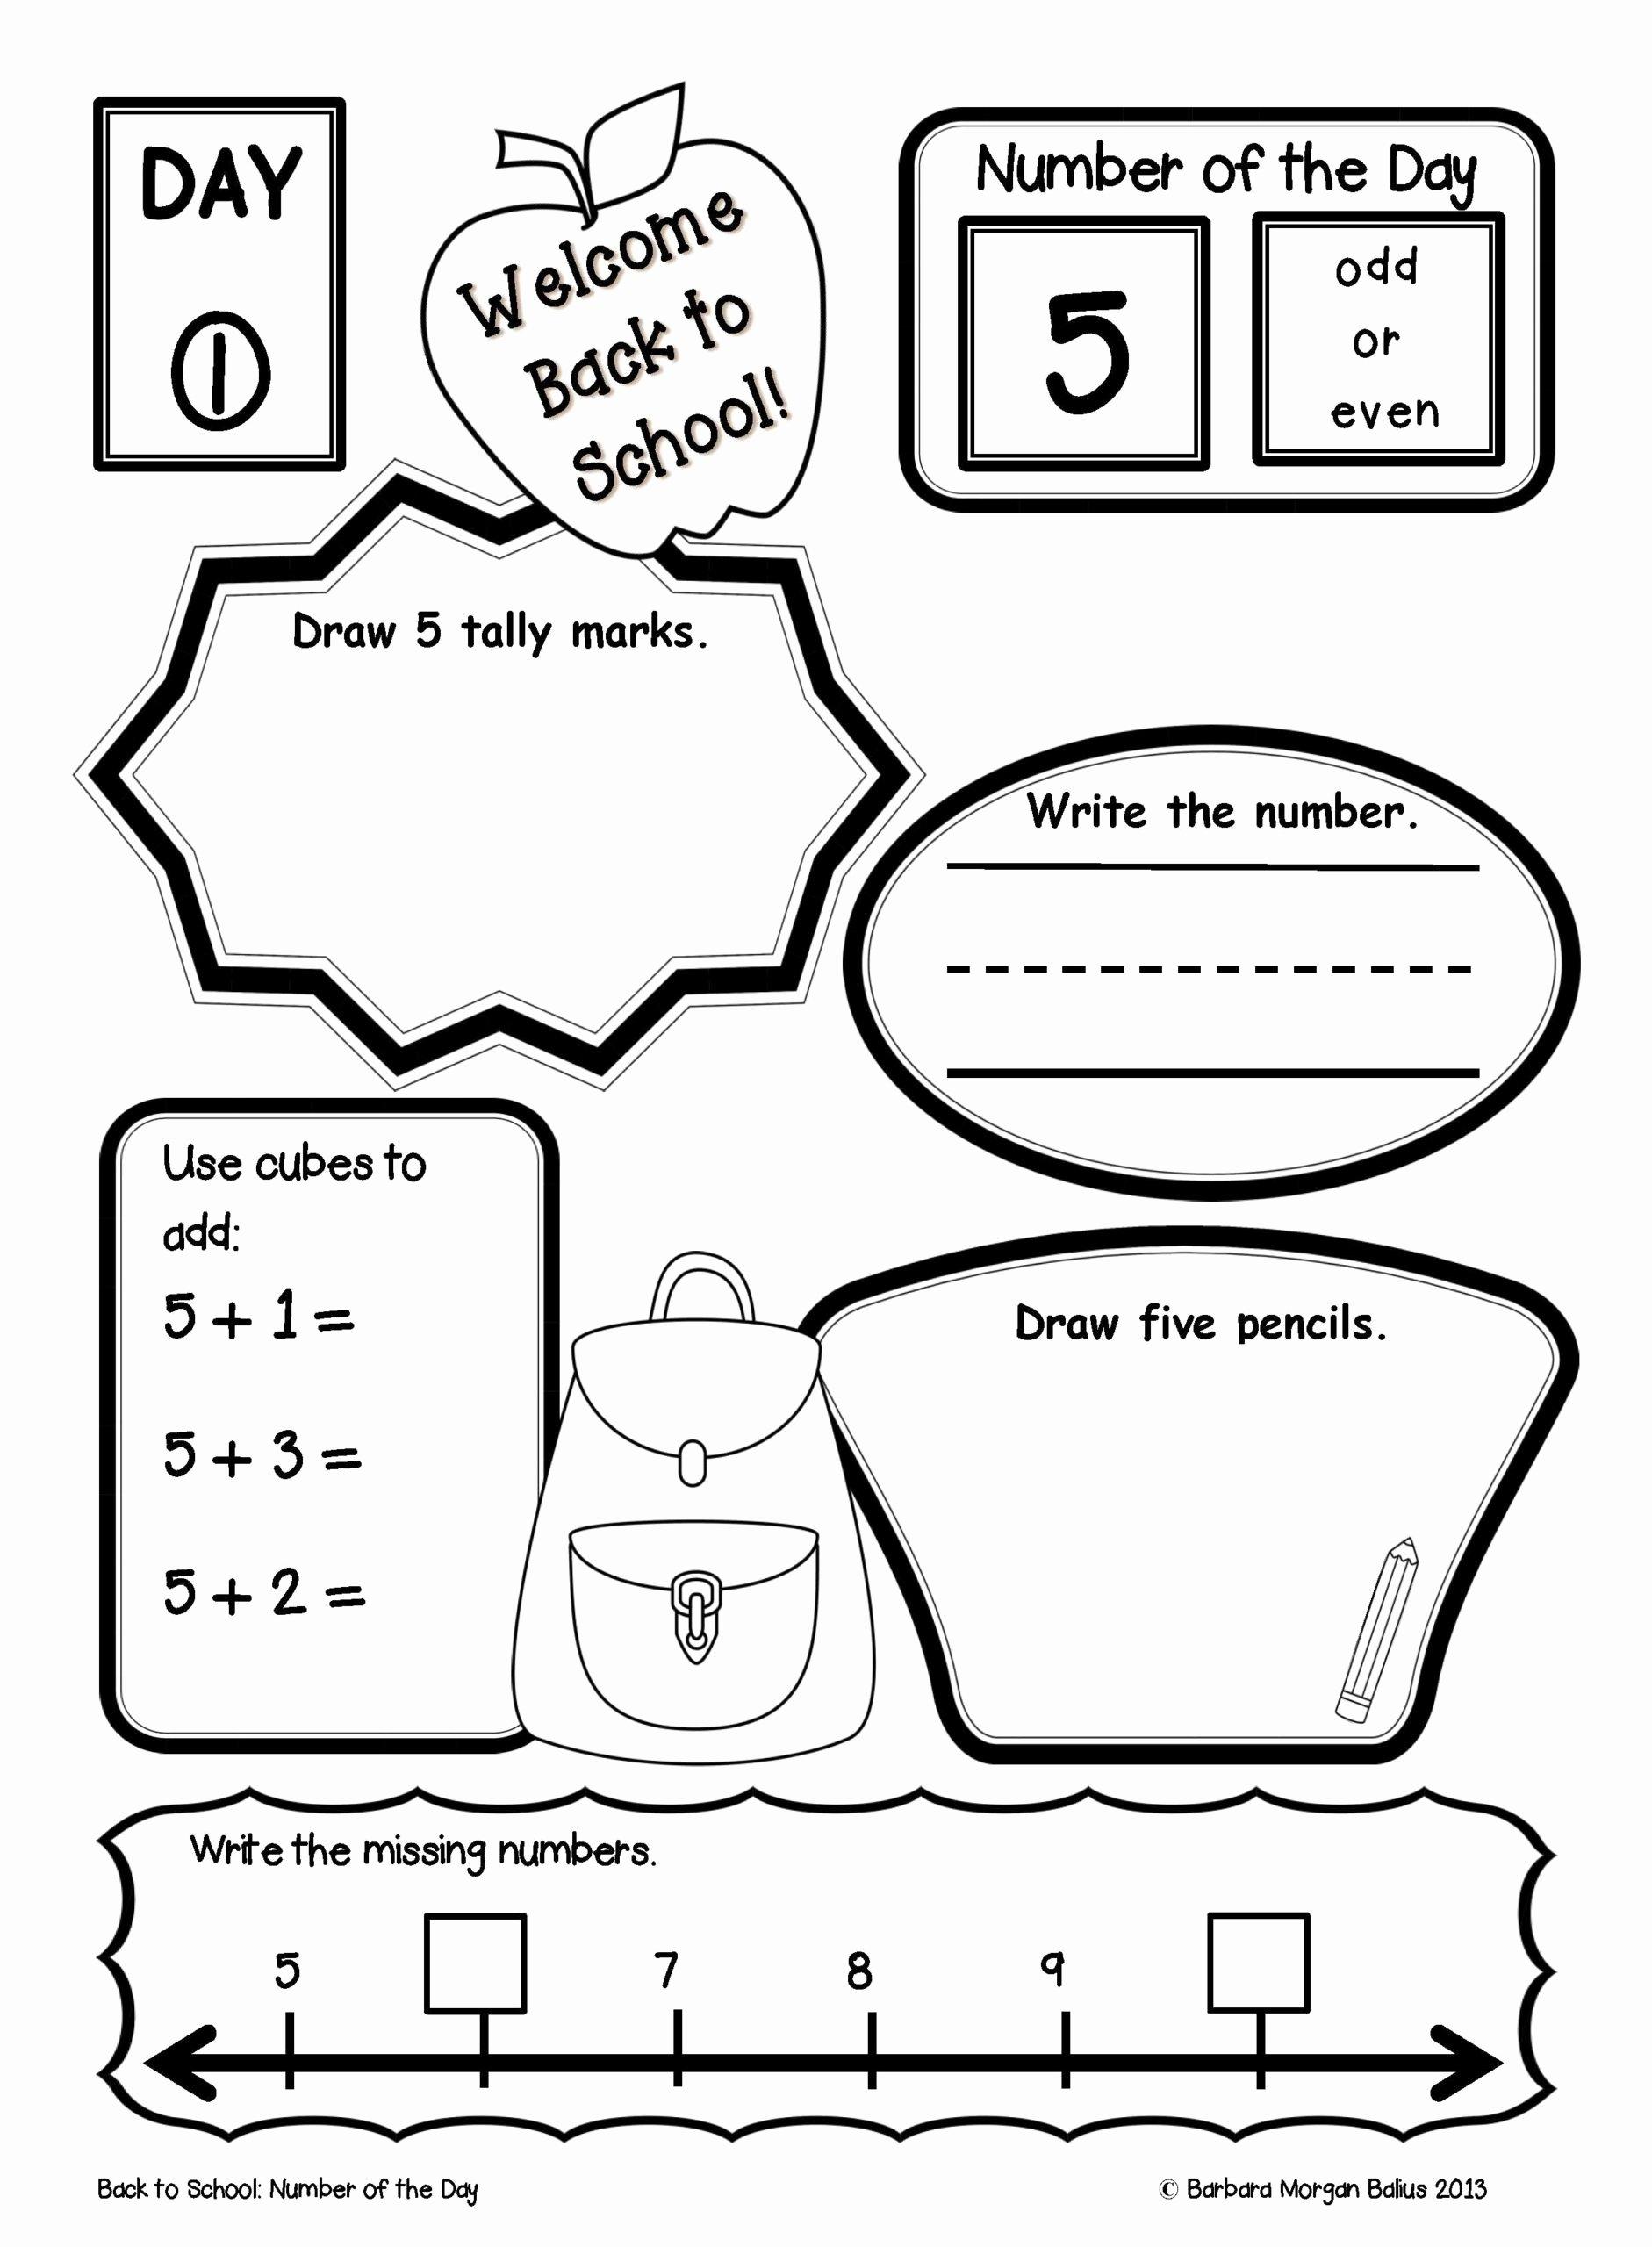 Place Value Worksheets 1st Grade Best Of Worksheets Place Value Number Sense Practice the